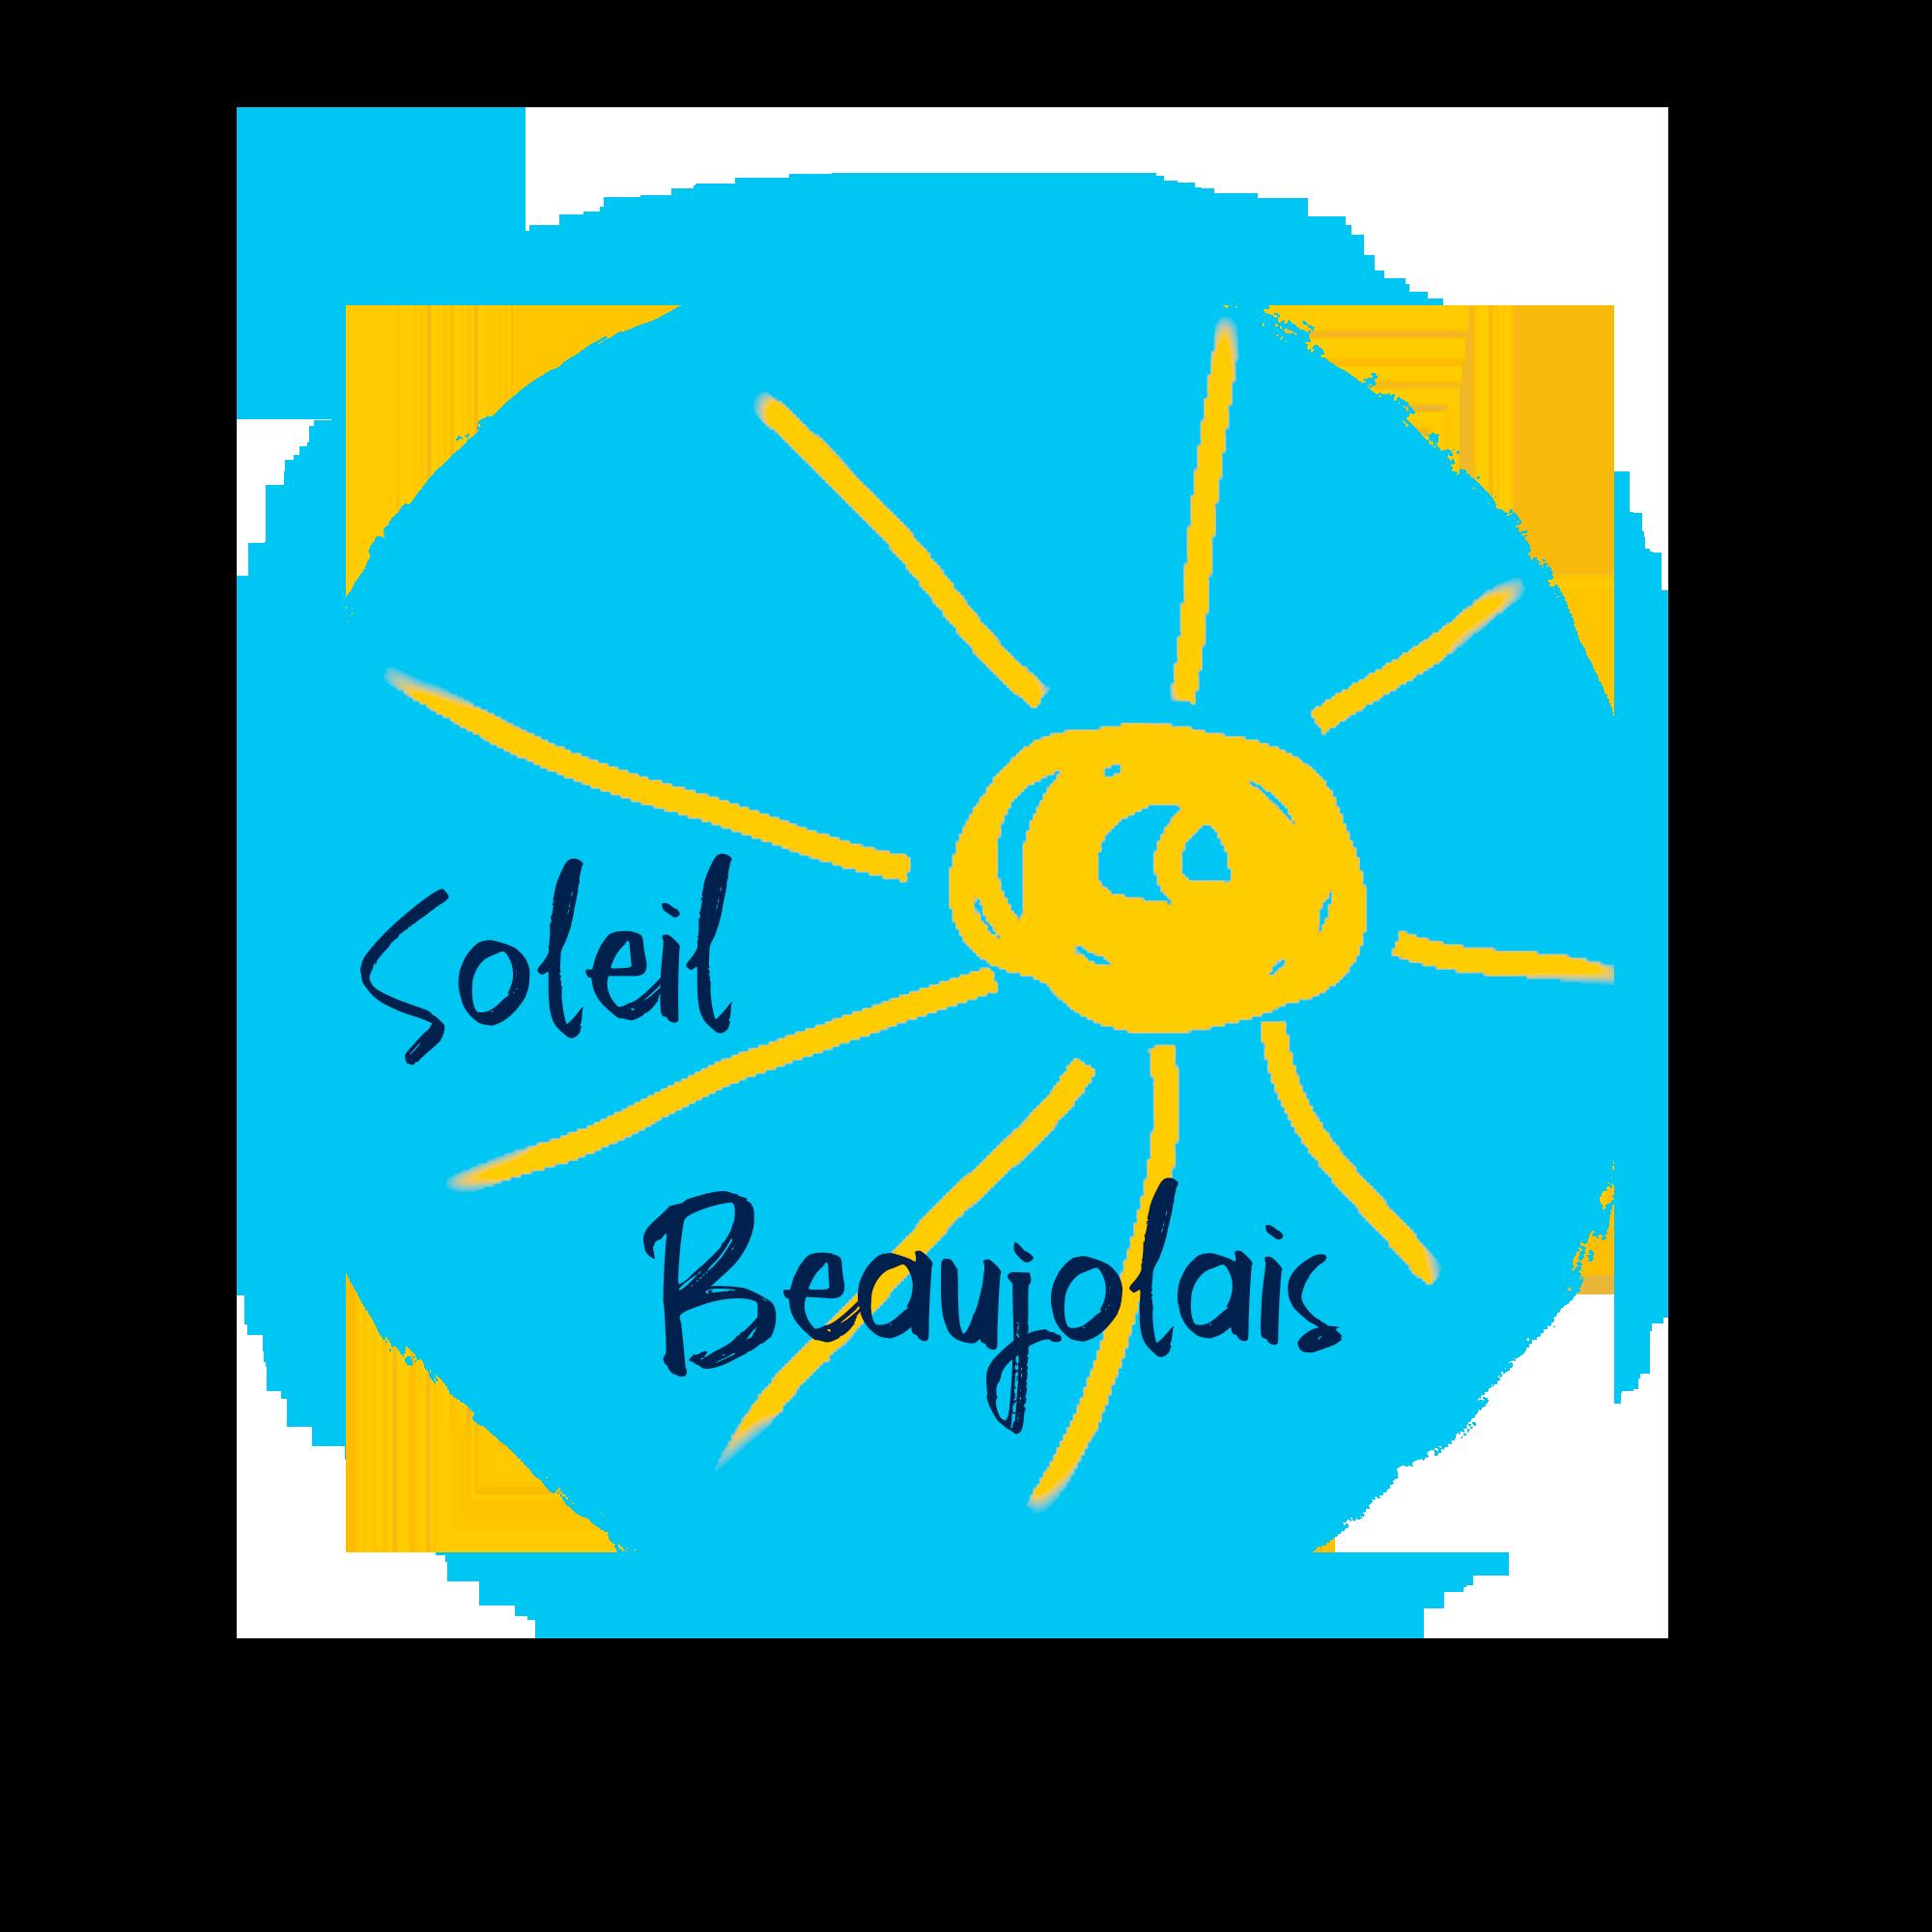 Soleil Beaujolais